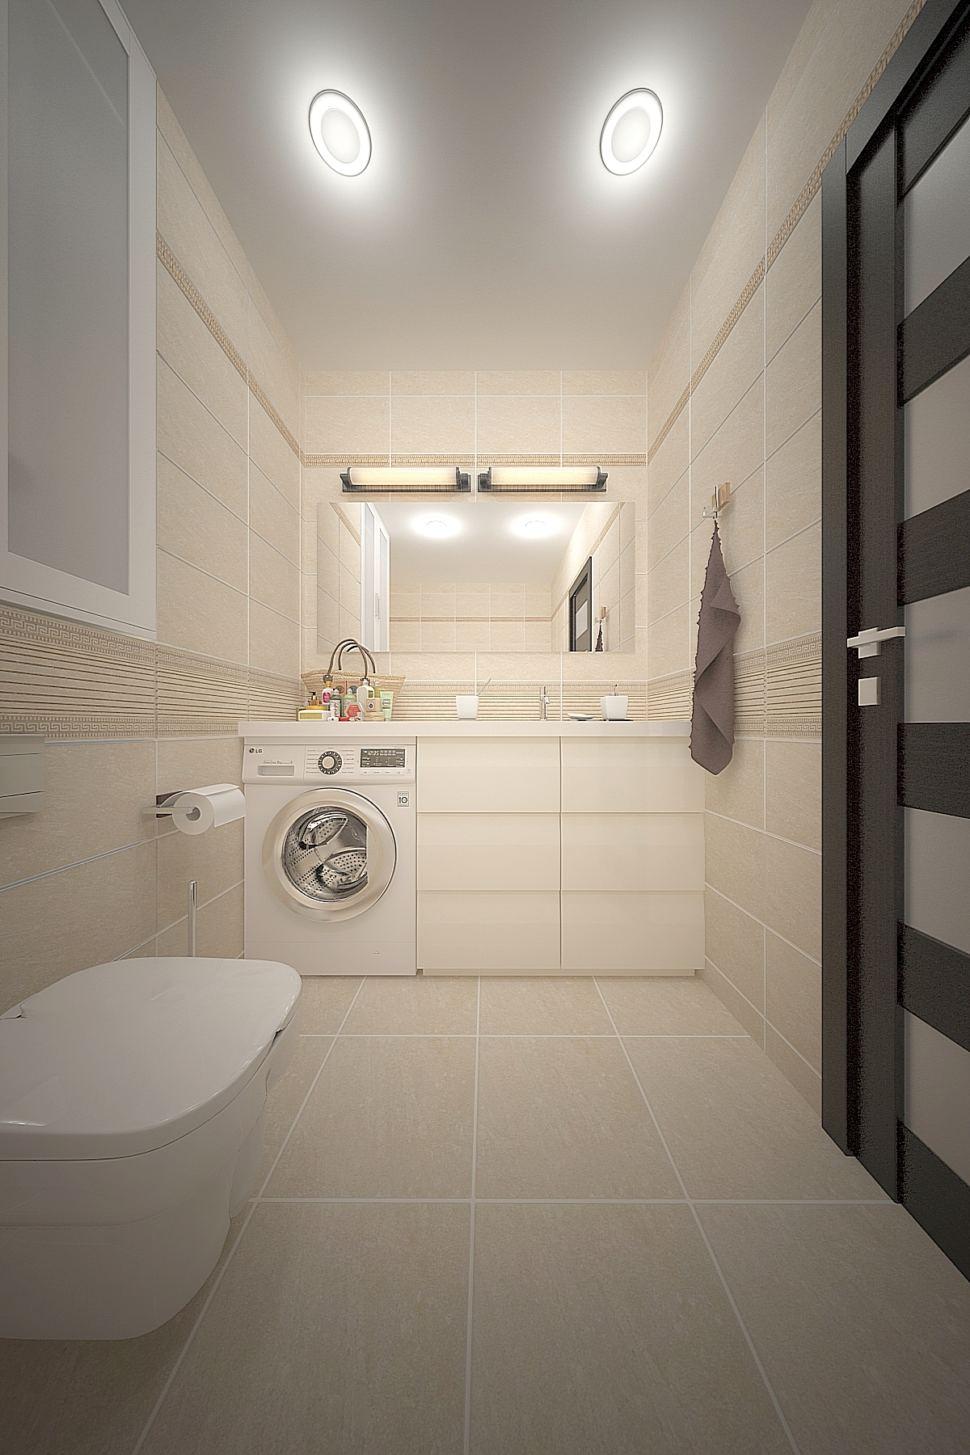 Проект ванной комнаты 3 кв.м в бежевых тонах, межкомнатная дверь, белый шкаф, стиральная машина, тумба, мойка, зеркало